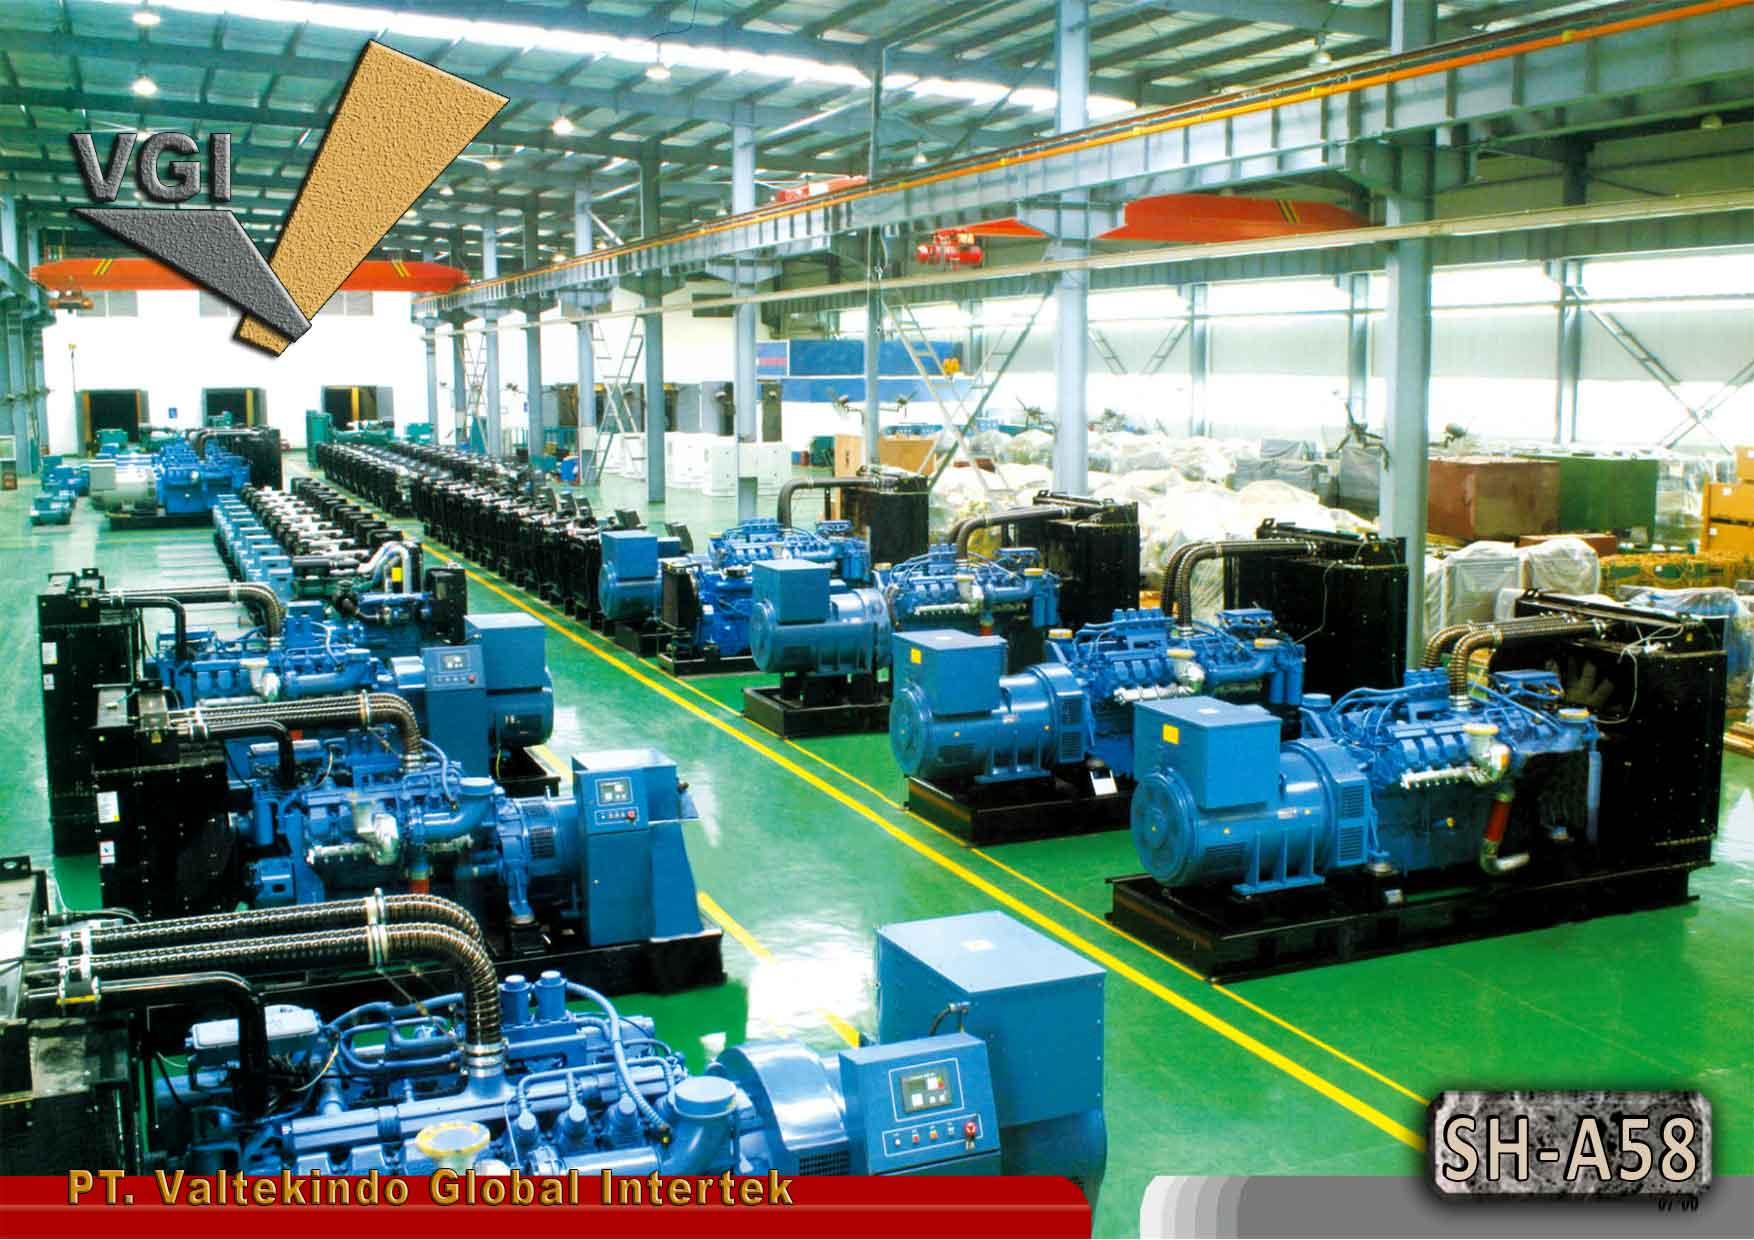 jual mesin, harga mesin, jual mesin bandung, distributor mesin, jual mesin karet, daur ulang karet, daur ulang plastik, mesin pertanian SHANHUA International  SHANHUA International